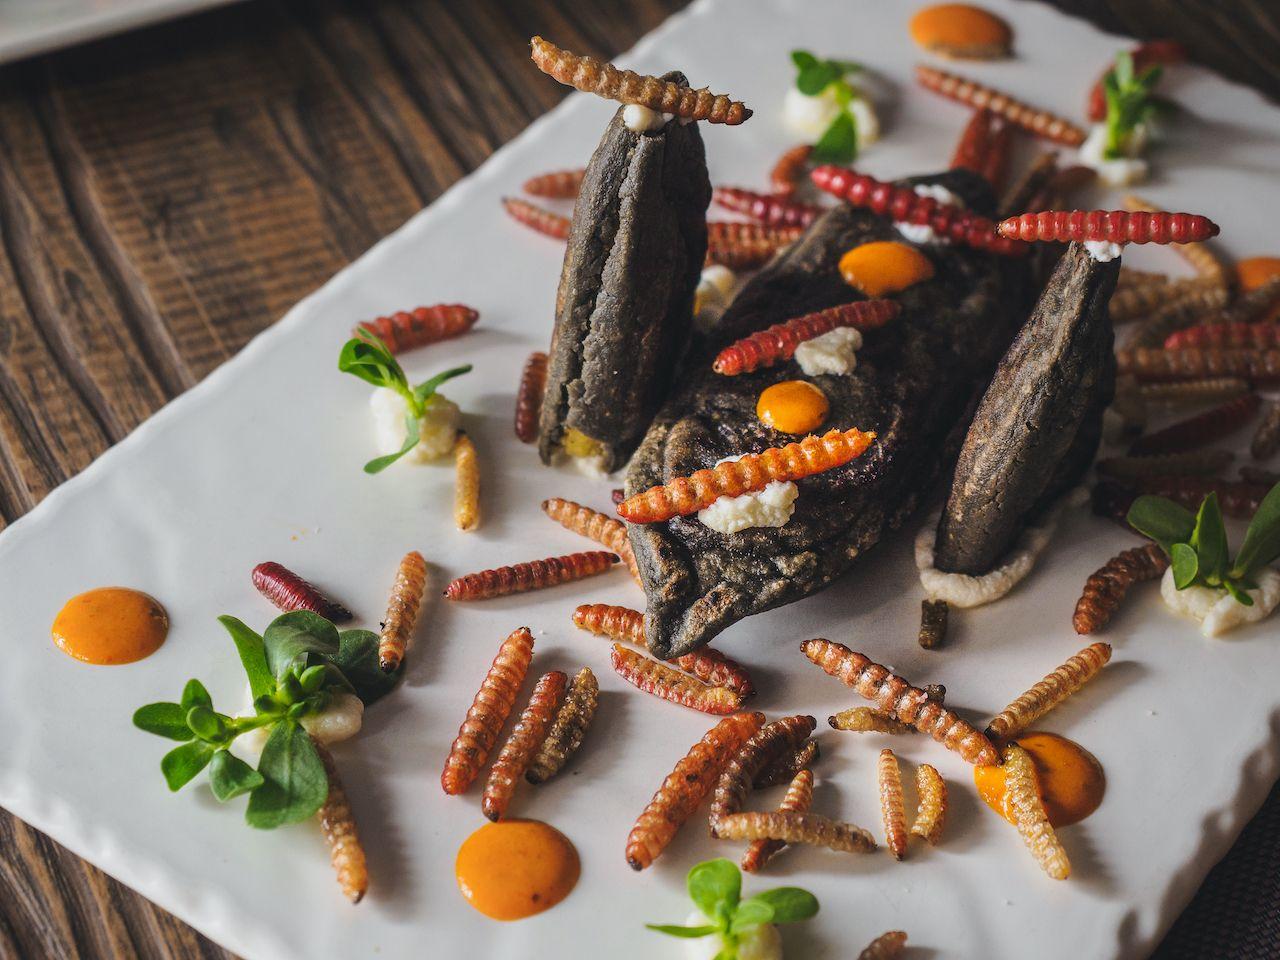 festival-gastronomico-insectos-comestibles-mexicanos